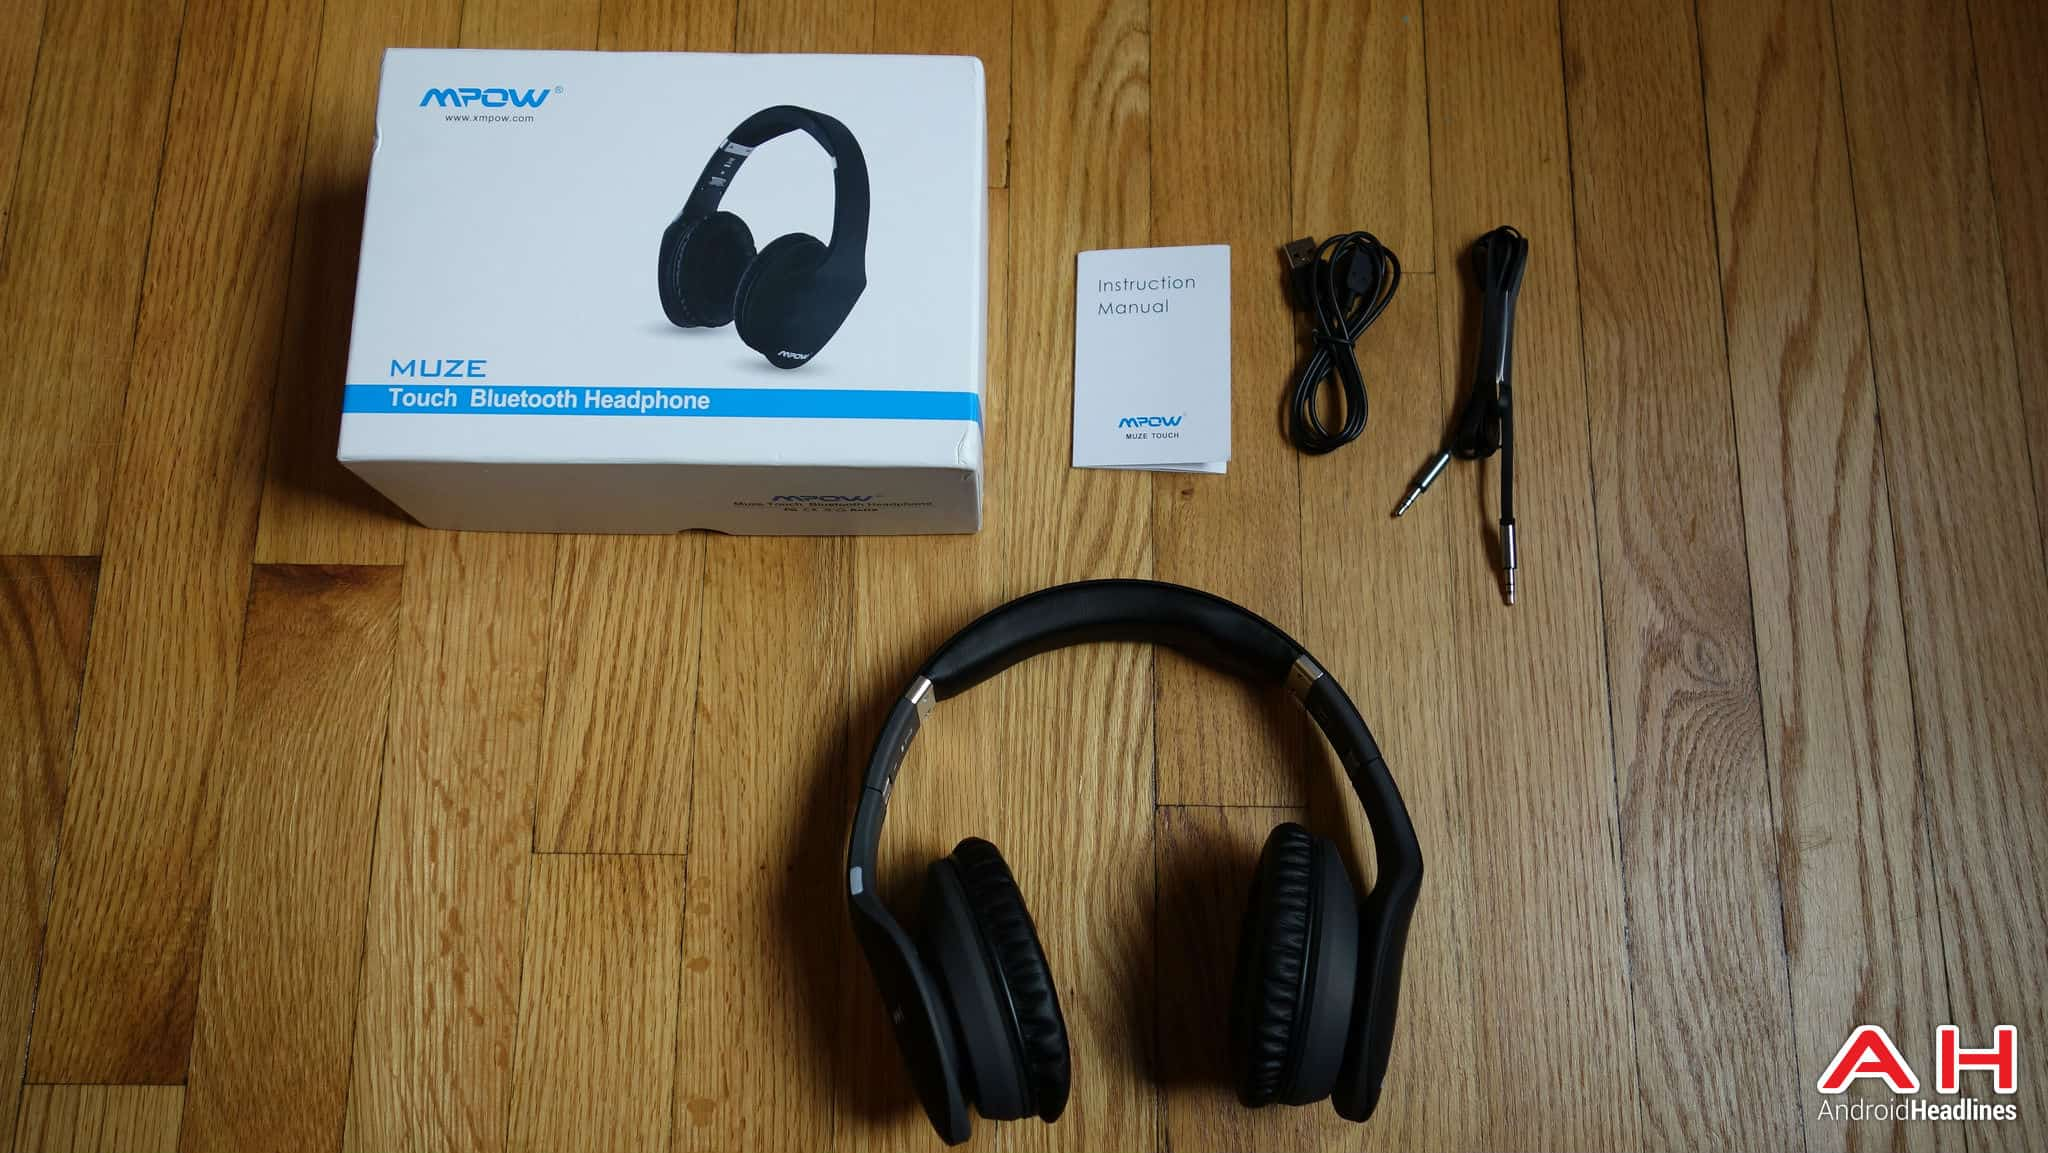 mpow muze touch bluetooth headphones 10